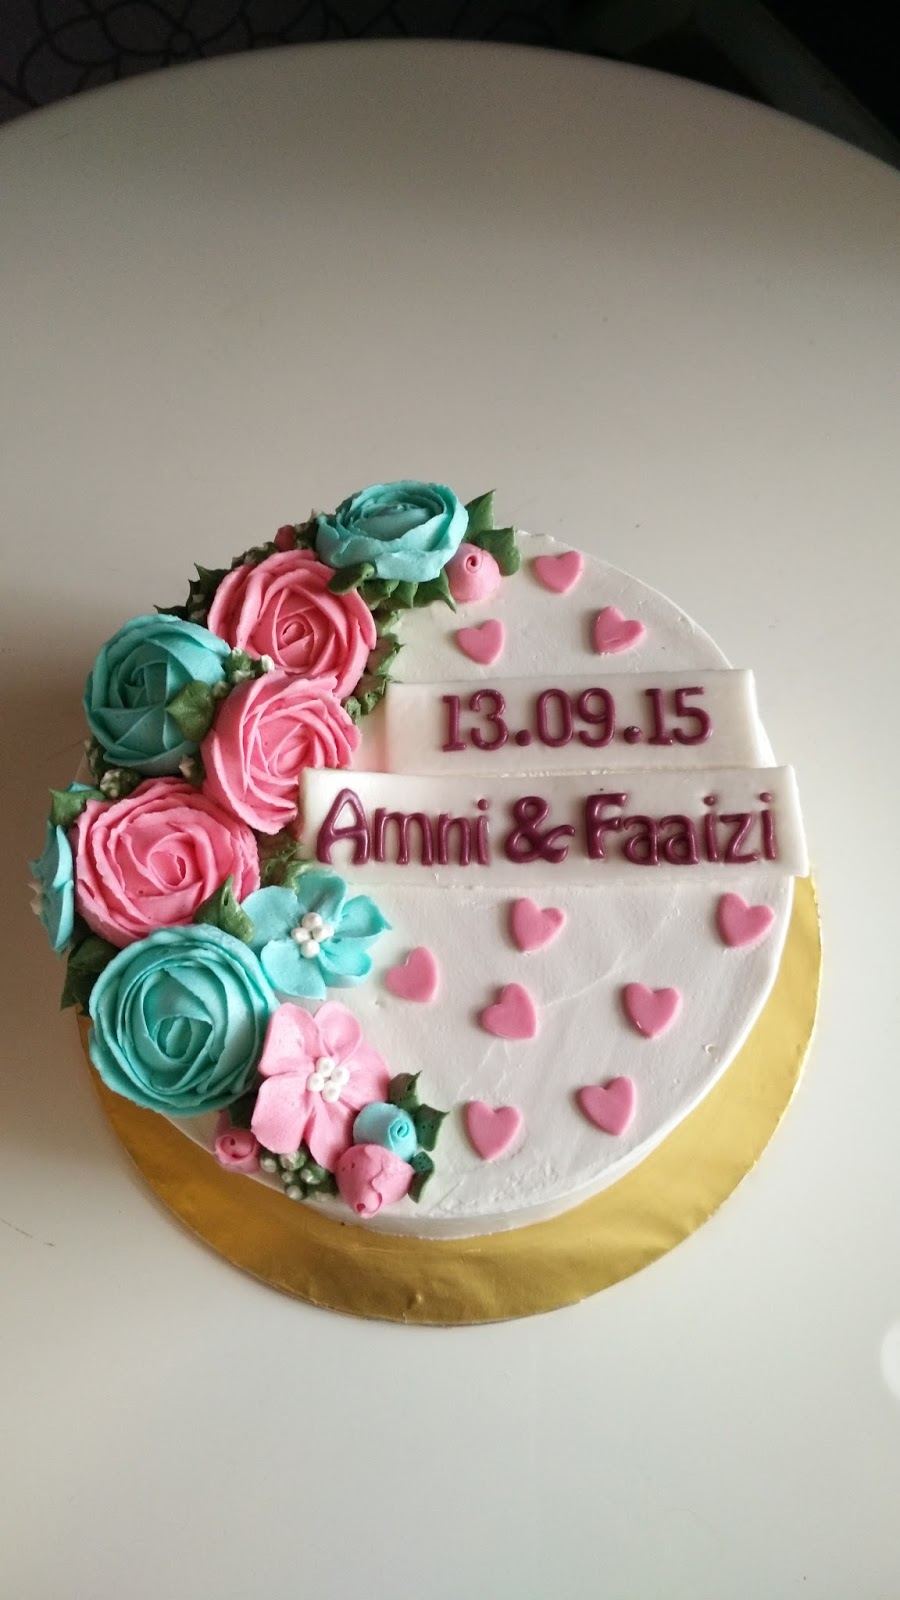 Halal Cake Delivery In Kl